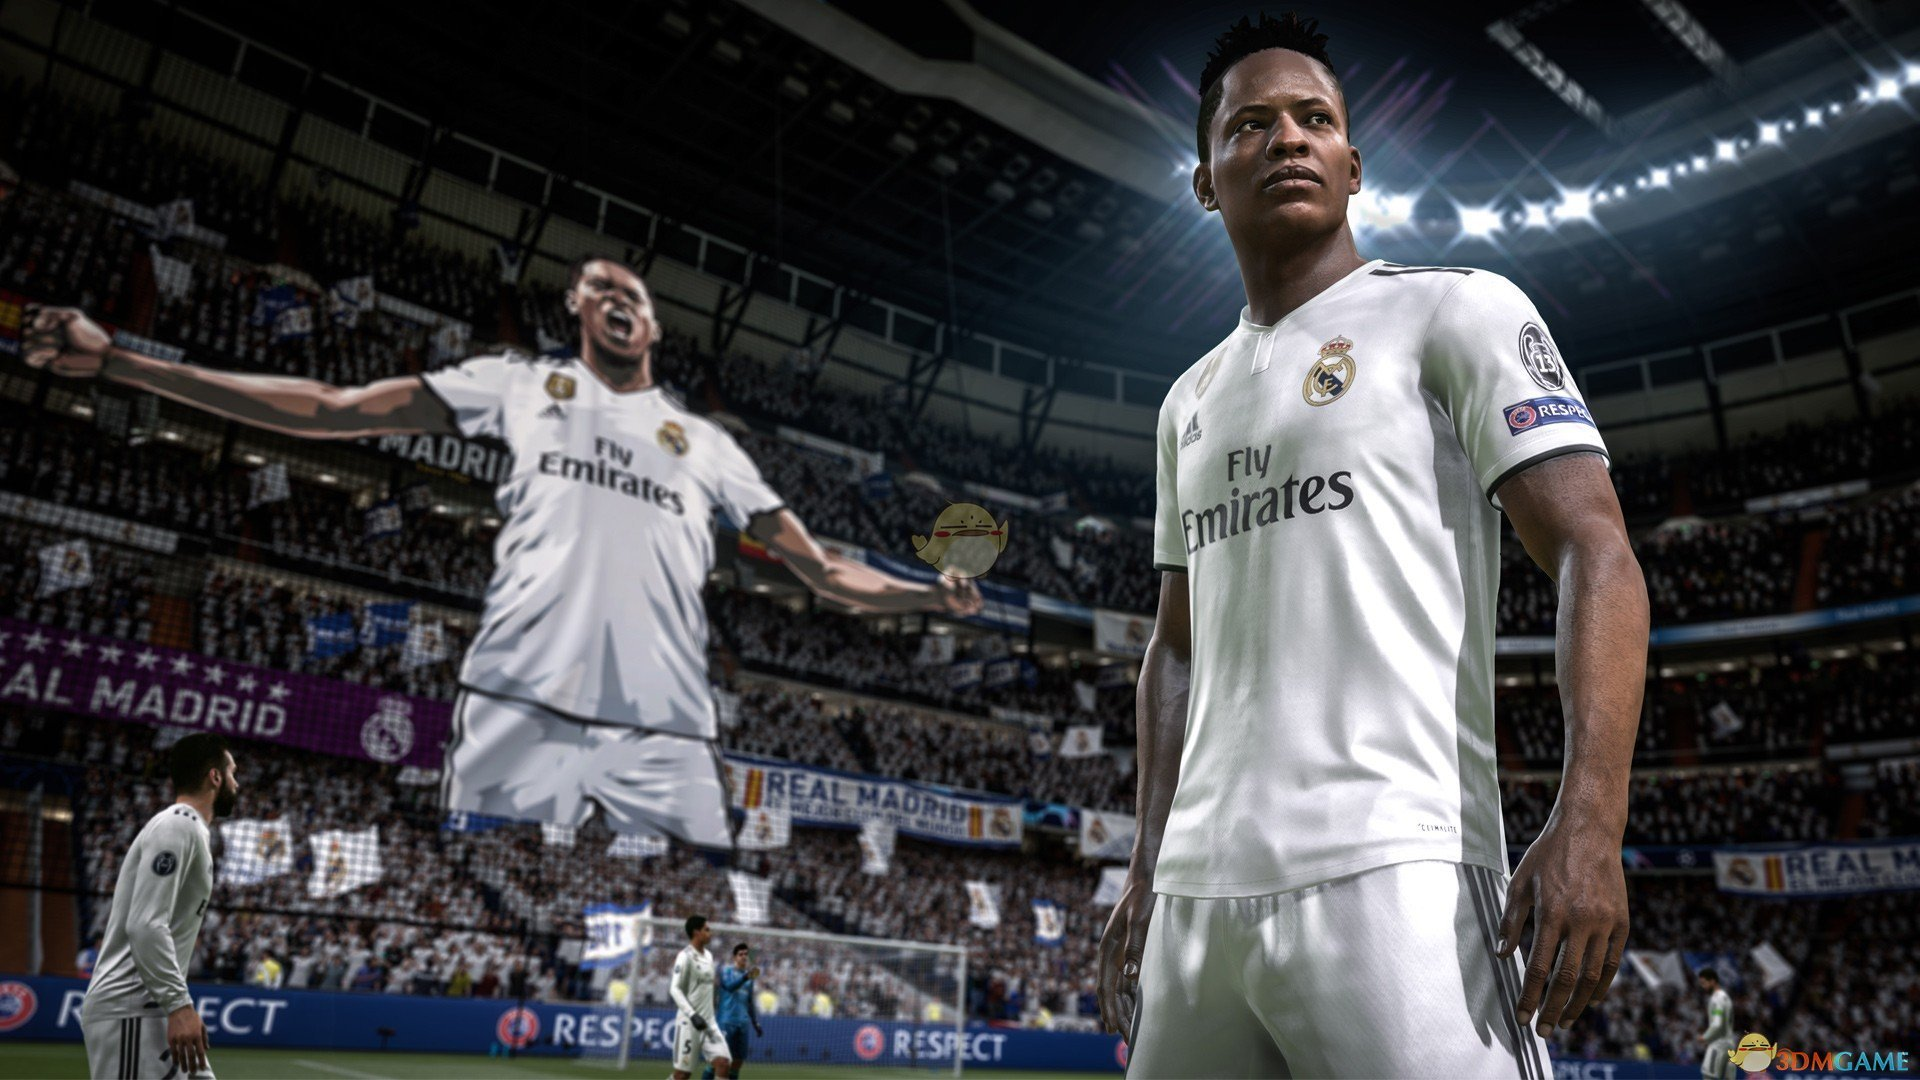 《FIFA 19》新形式翻译 新形式概况一览